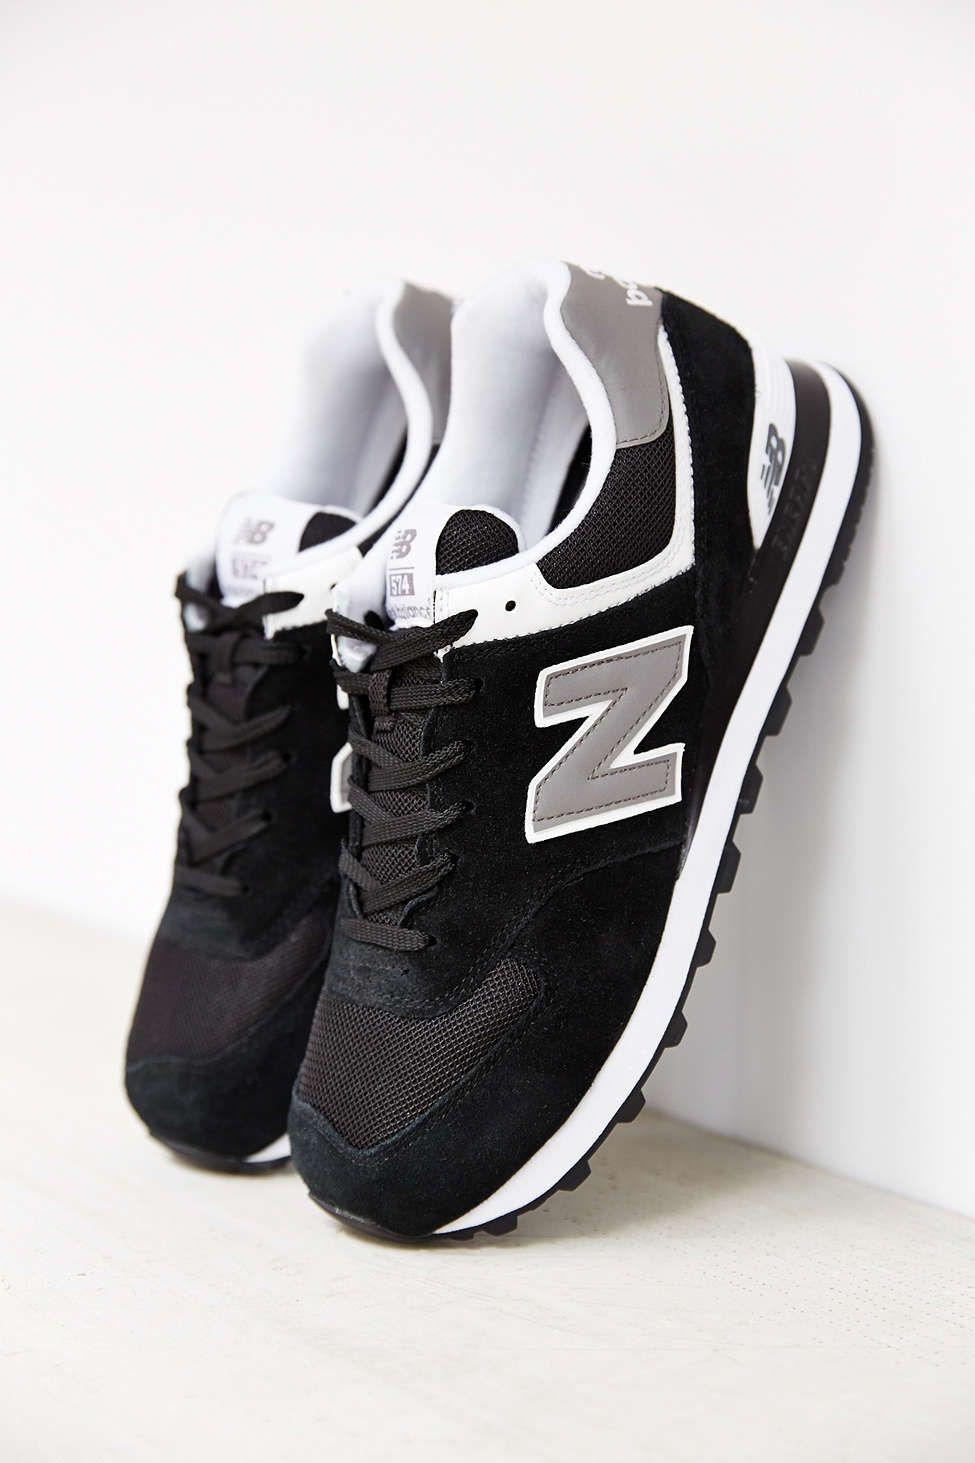 New Balance 574 Core Sneakers New Balance Schuhe New Balance Schuhe Frauen New Balance Schuhe Herren